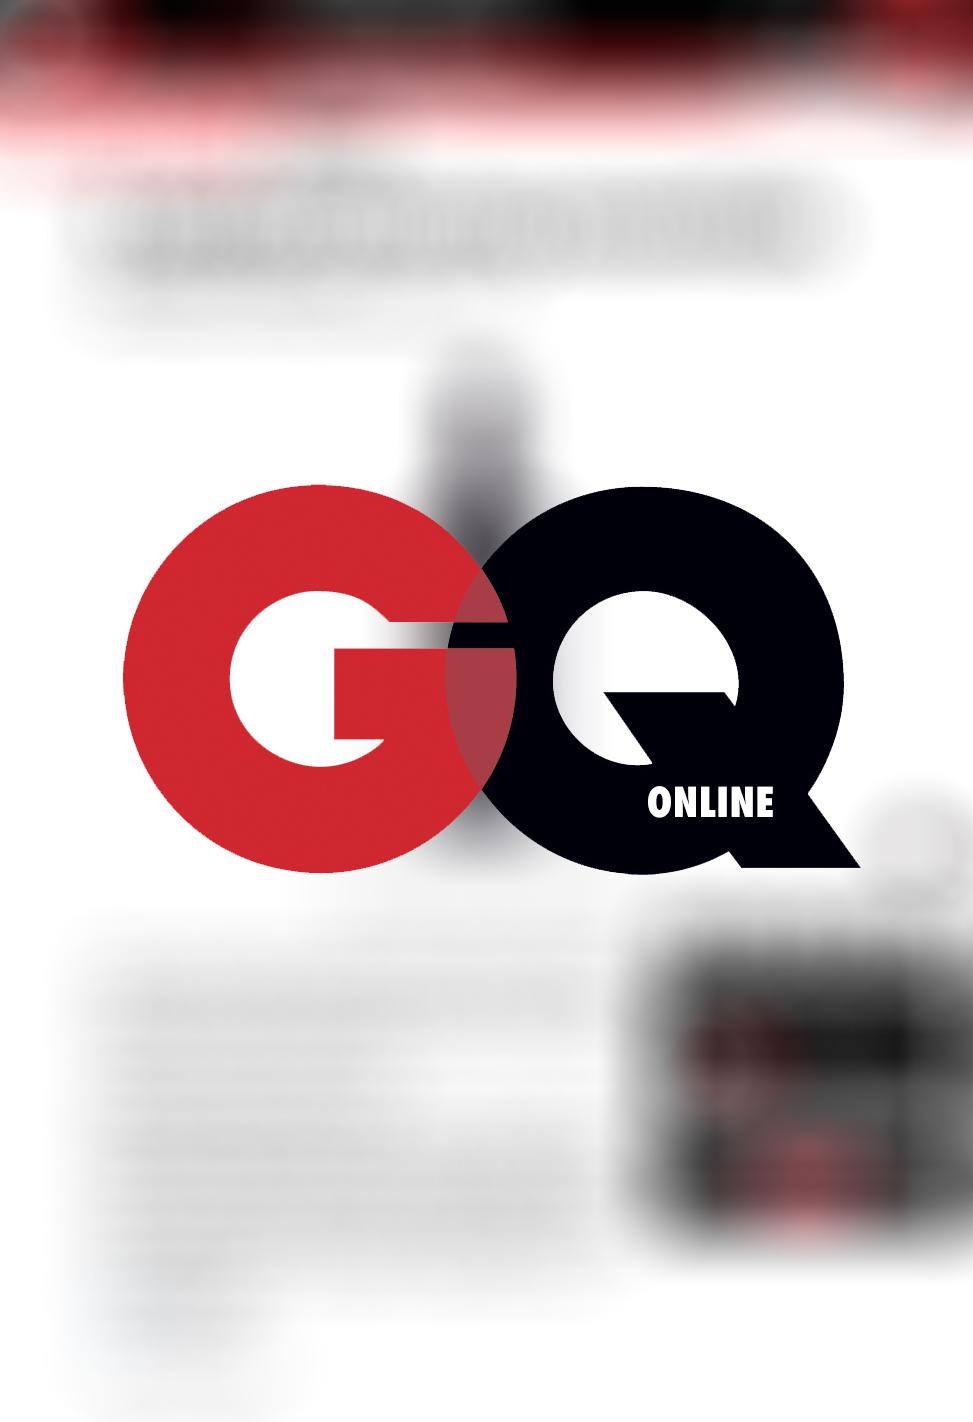 GQ Online